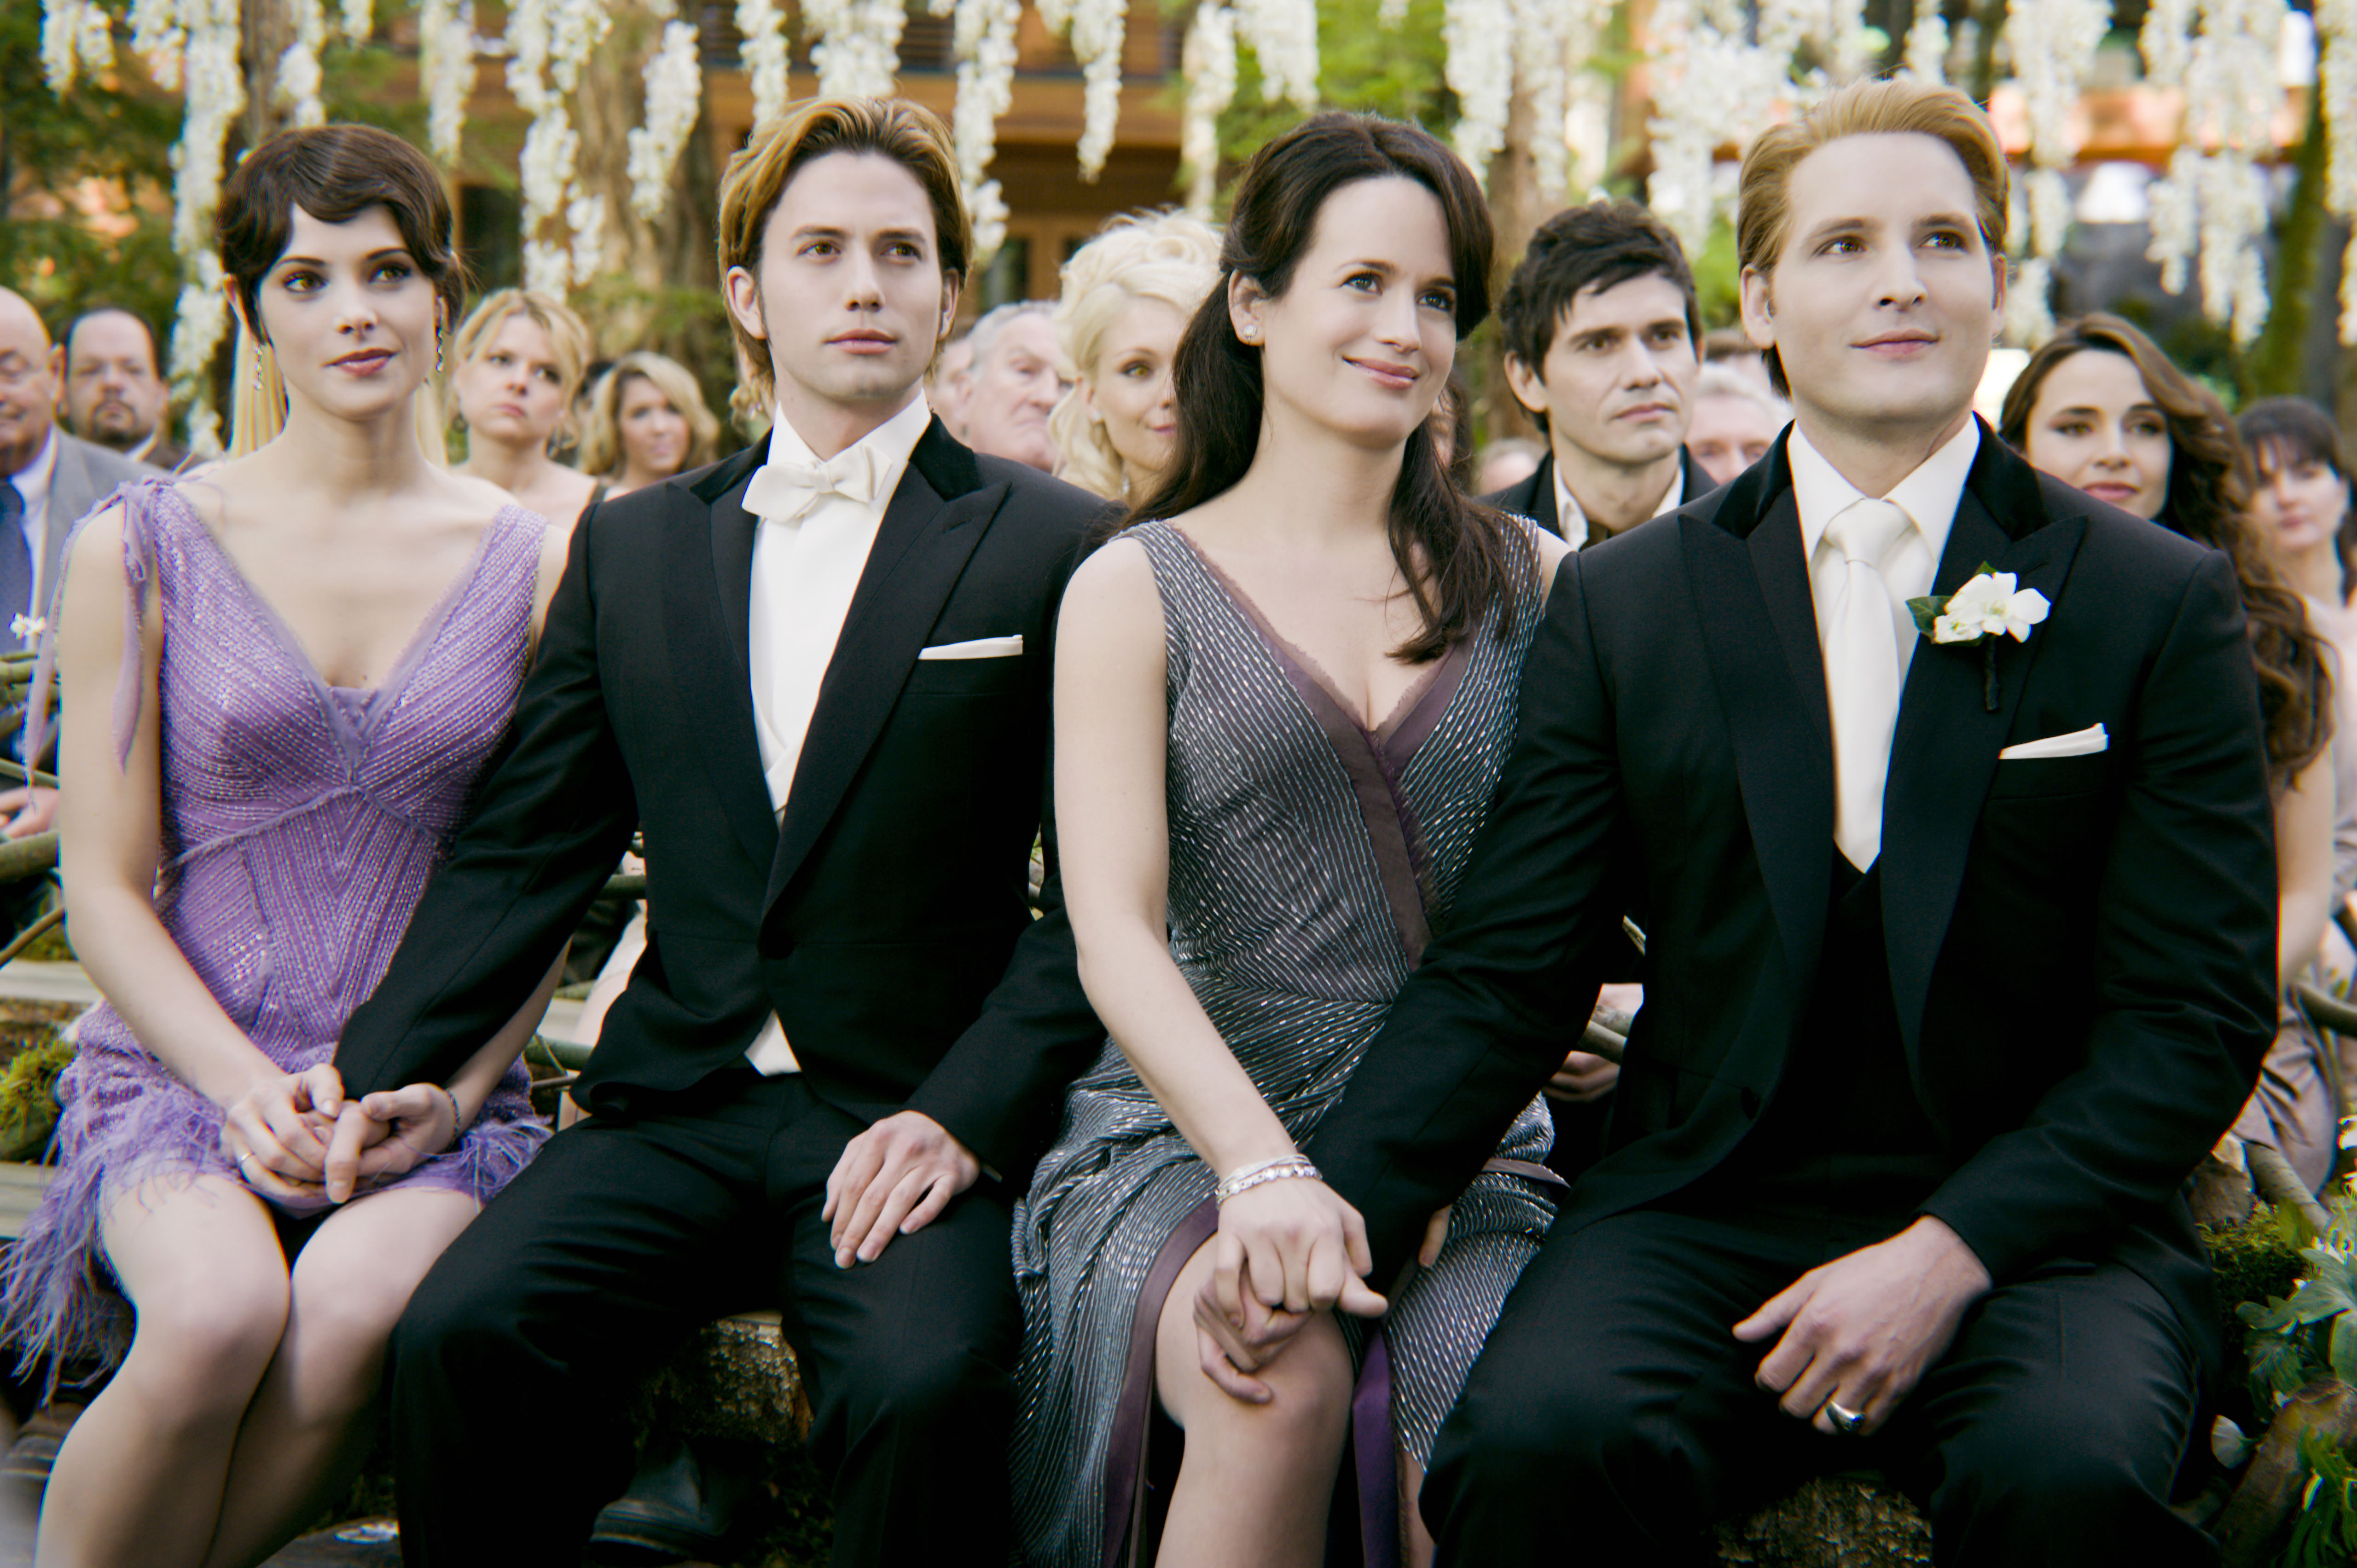 twilight-breaking-dawn-part-1-movie-image-cullen-wedding-01.jpg